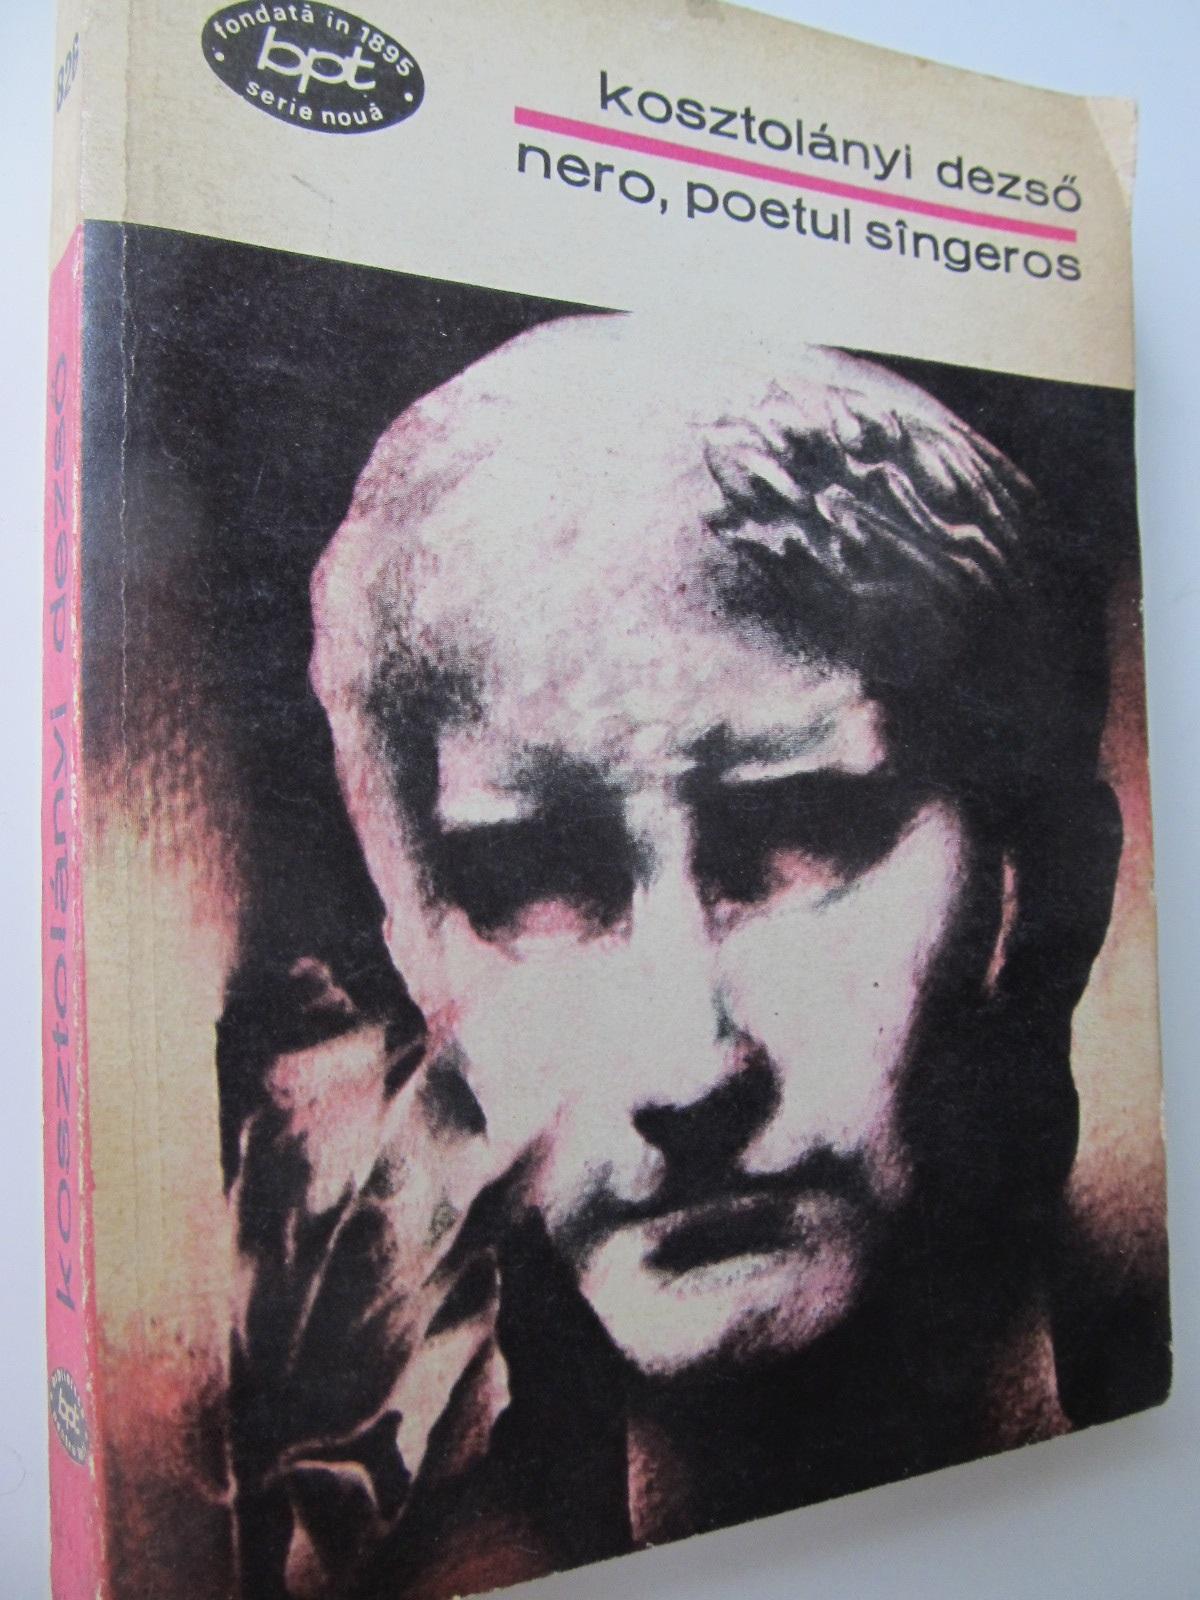 Nero poetul sangeros - Kosztolanyi Deszo | Detalii carte